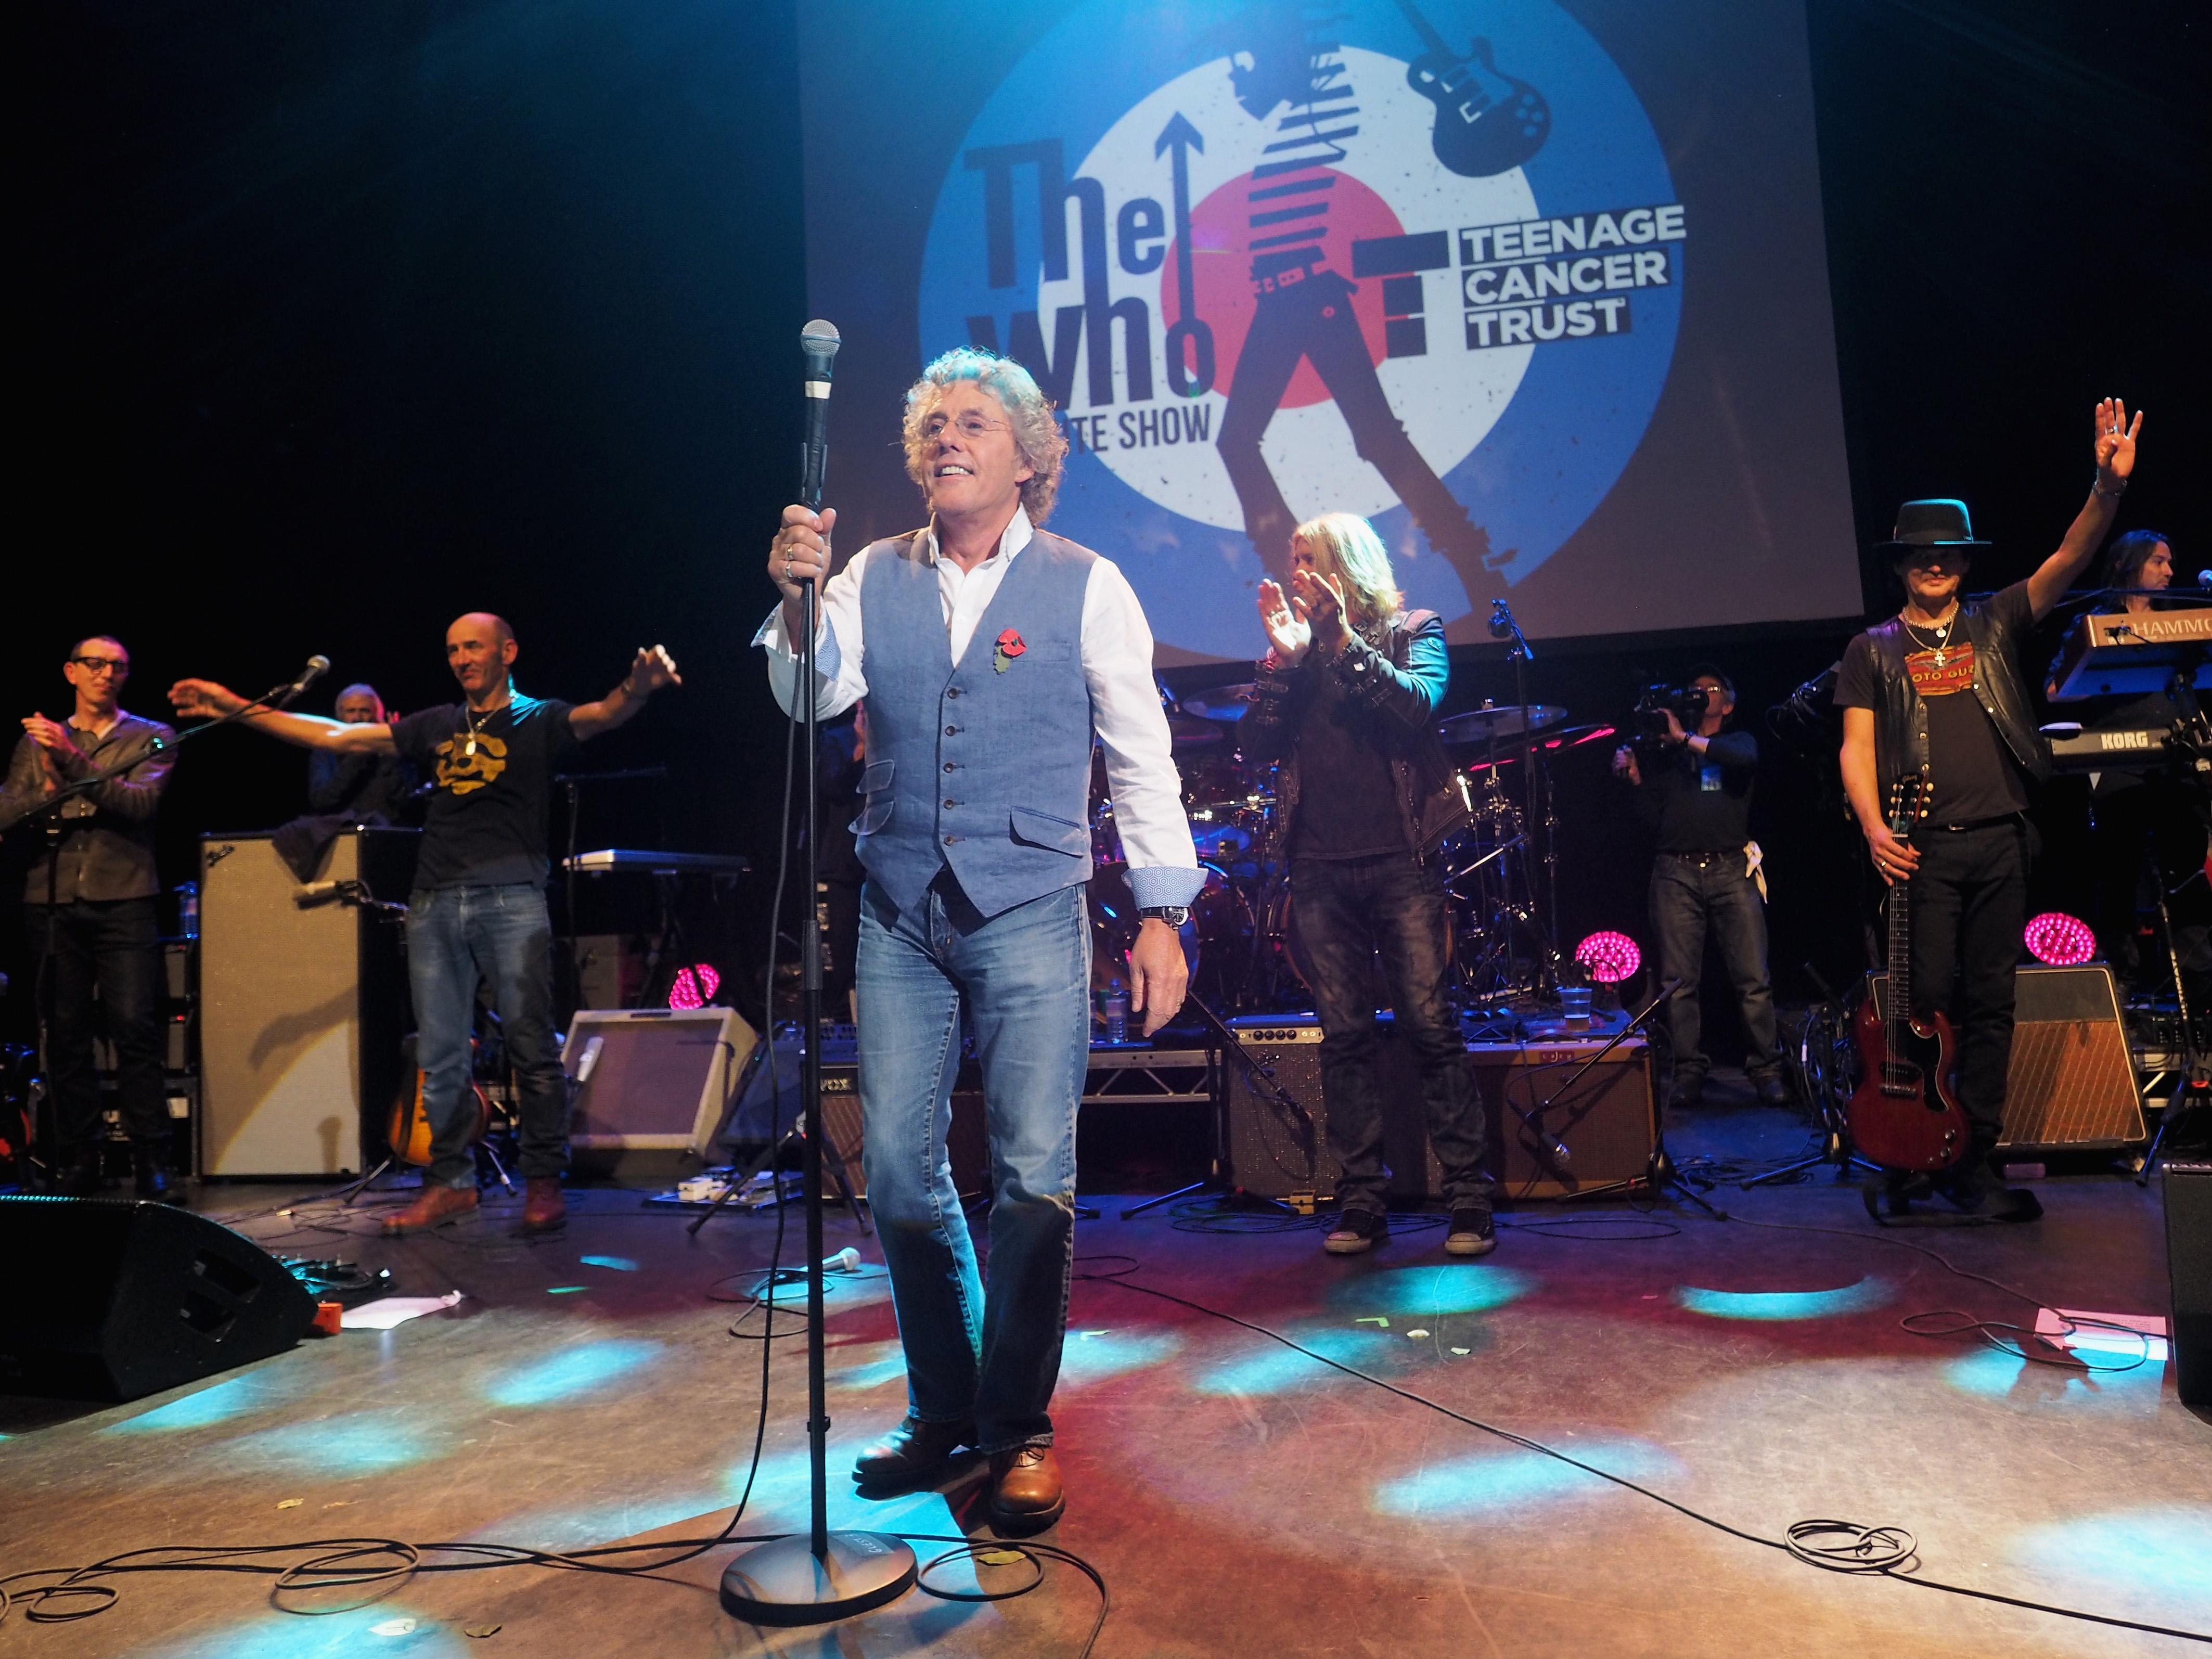 The Who Turn 50 With Birthday Gig Featuring Eddie Vedder, Liam Gallagher